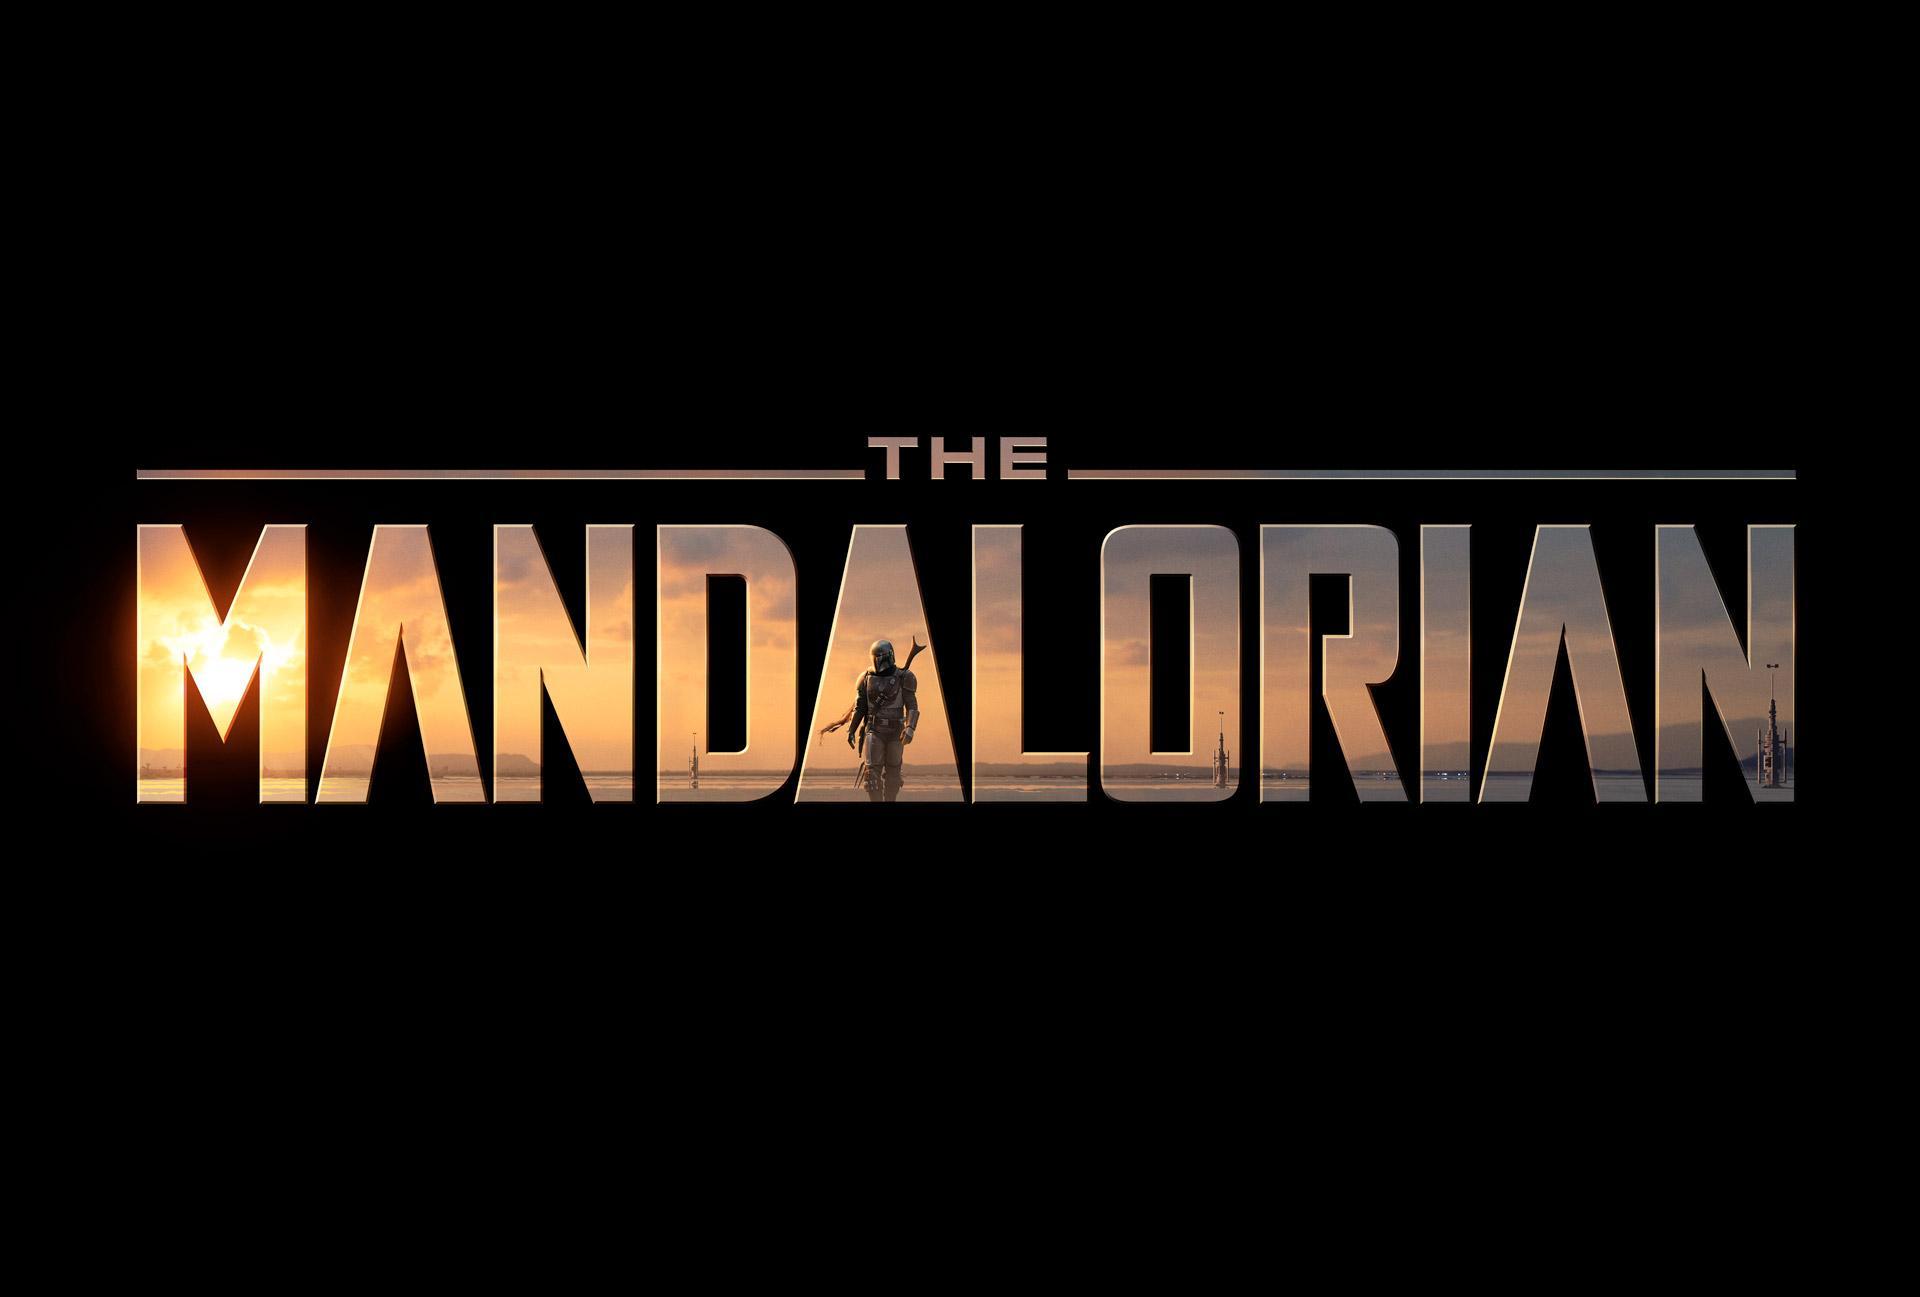 The Mandalorian - Promotional Poster